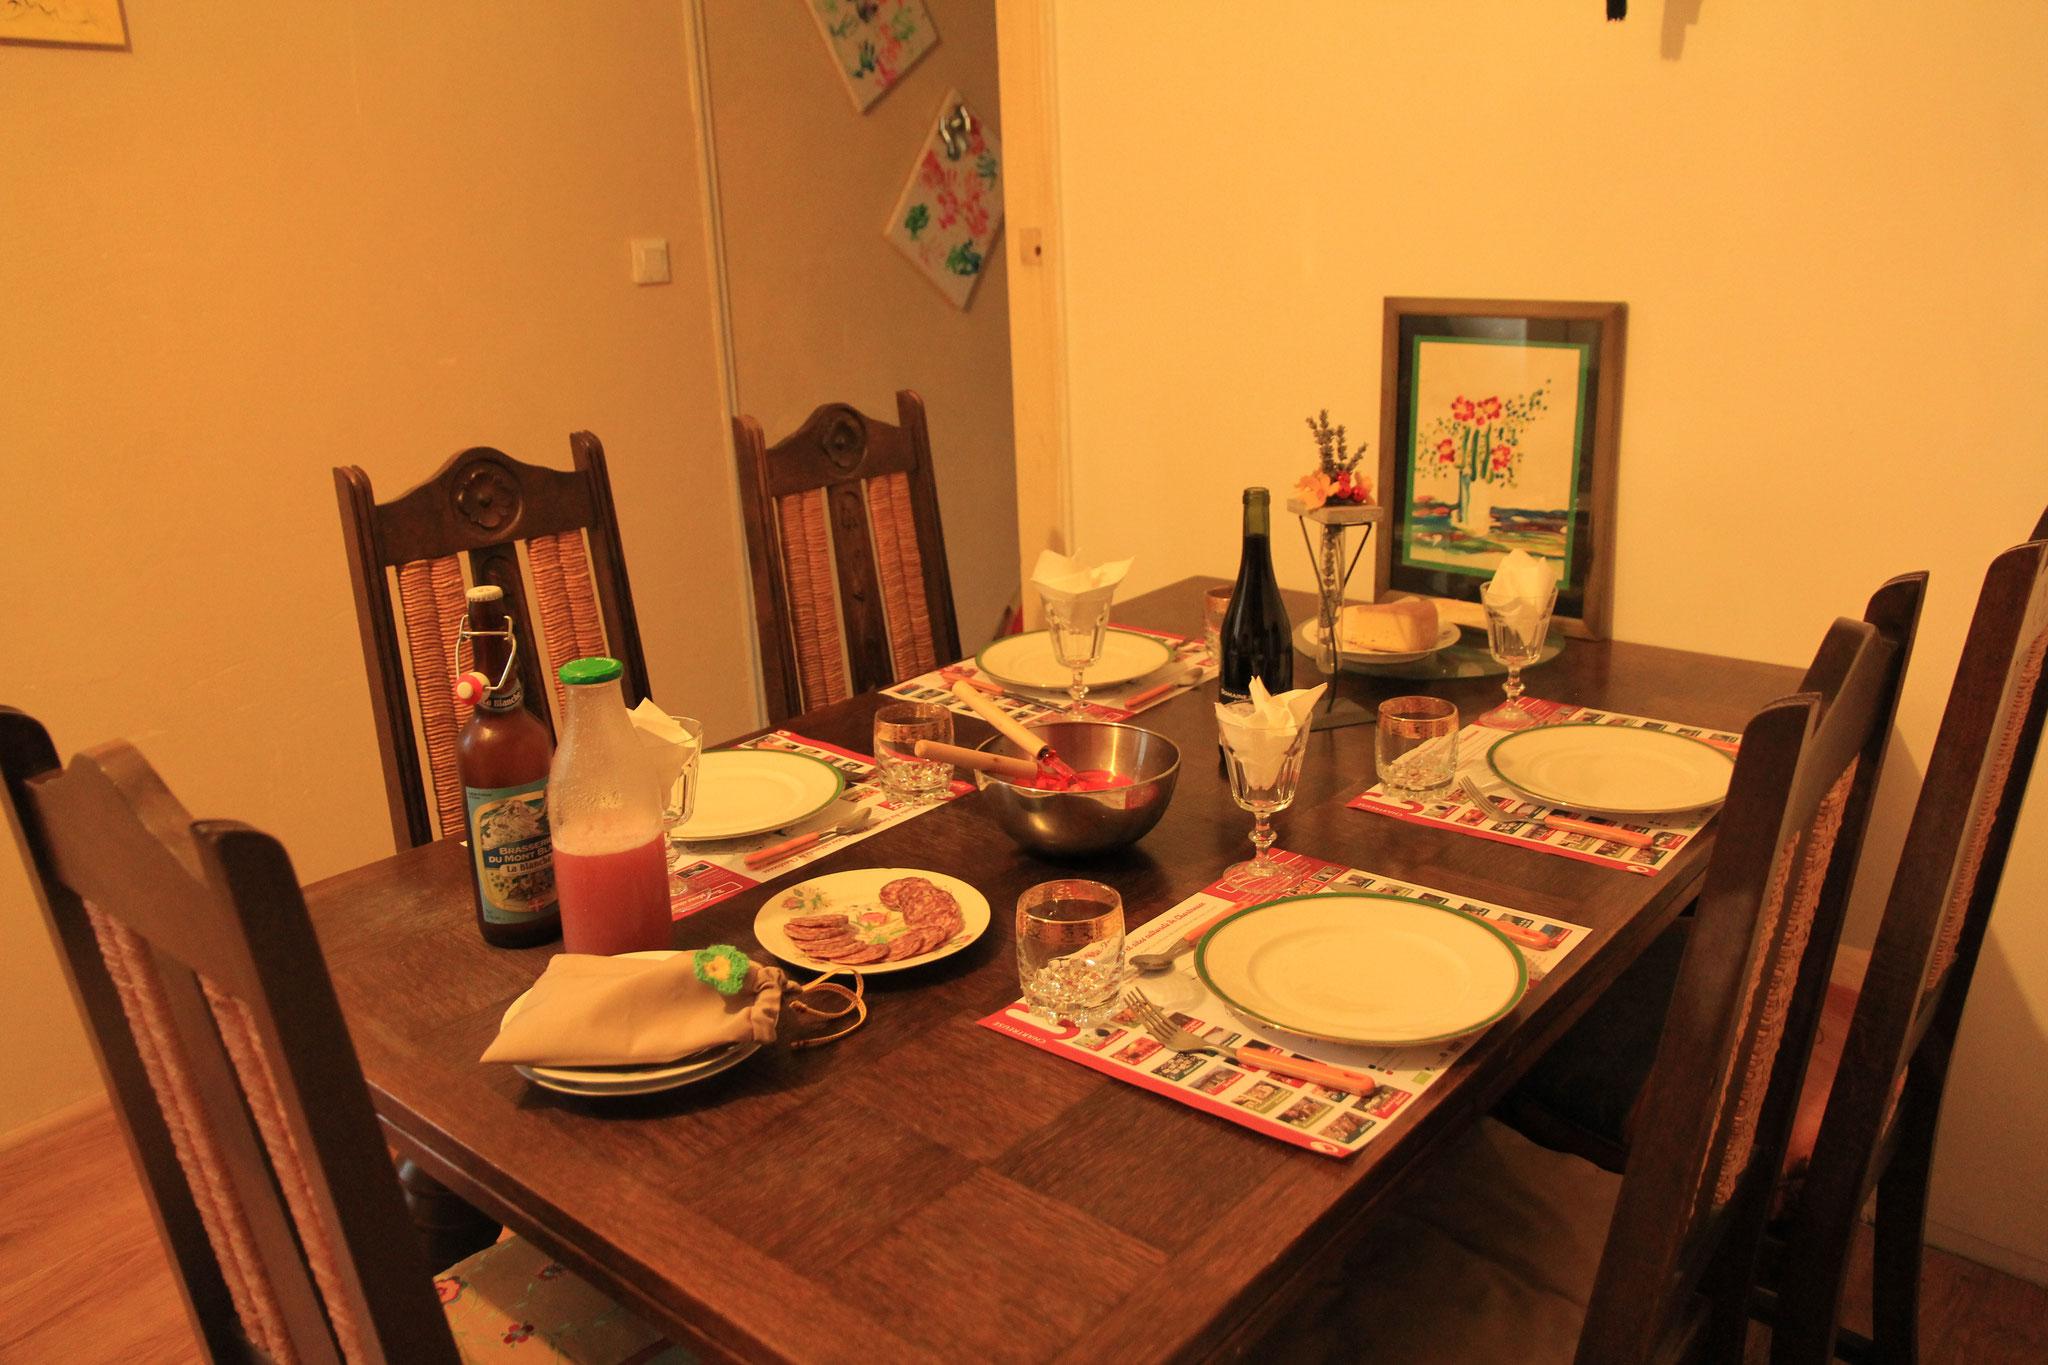 menu : bourguignon, gratin savoyard, clafoutis poires chartrousin, jus poire-framboises